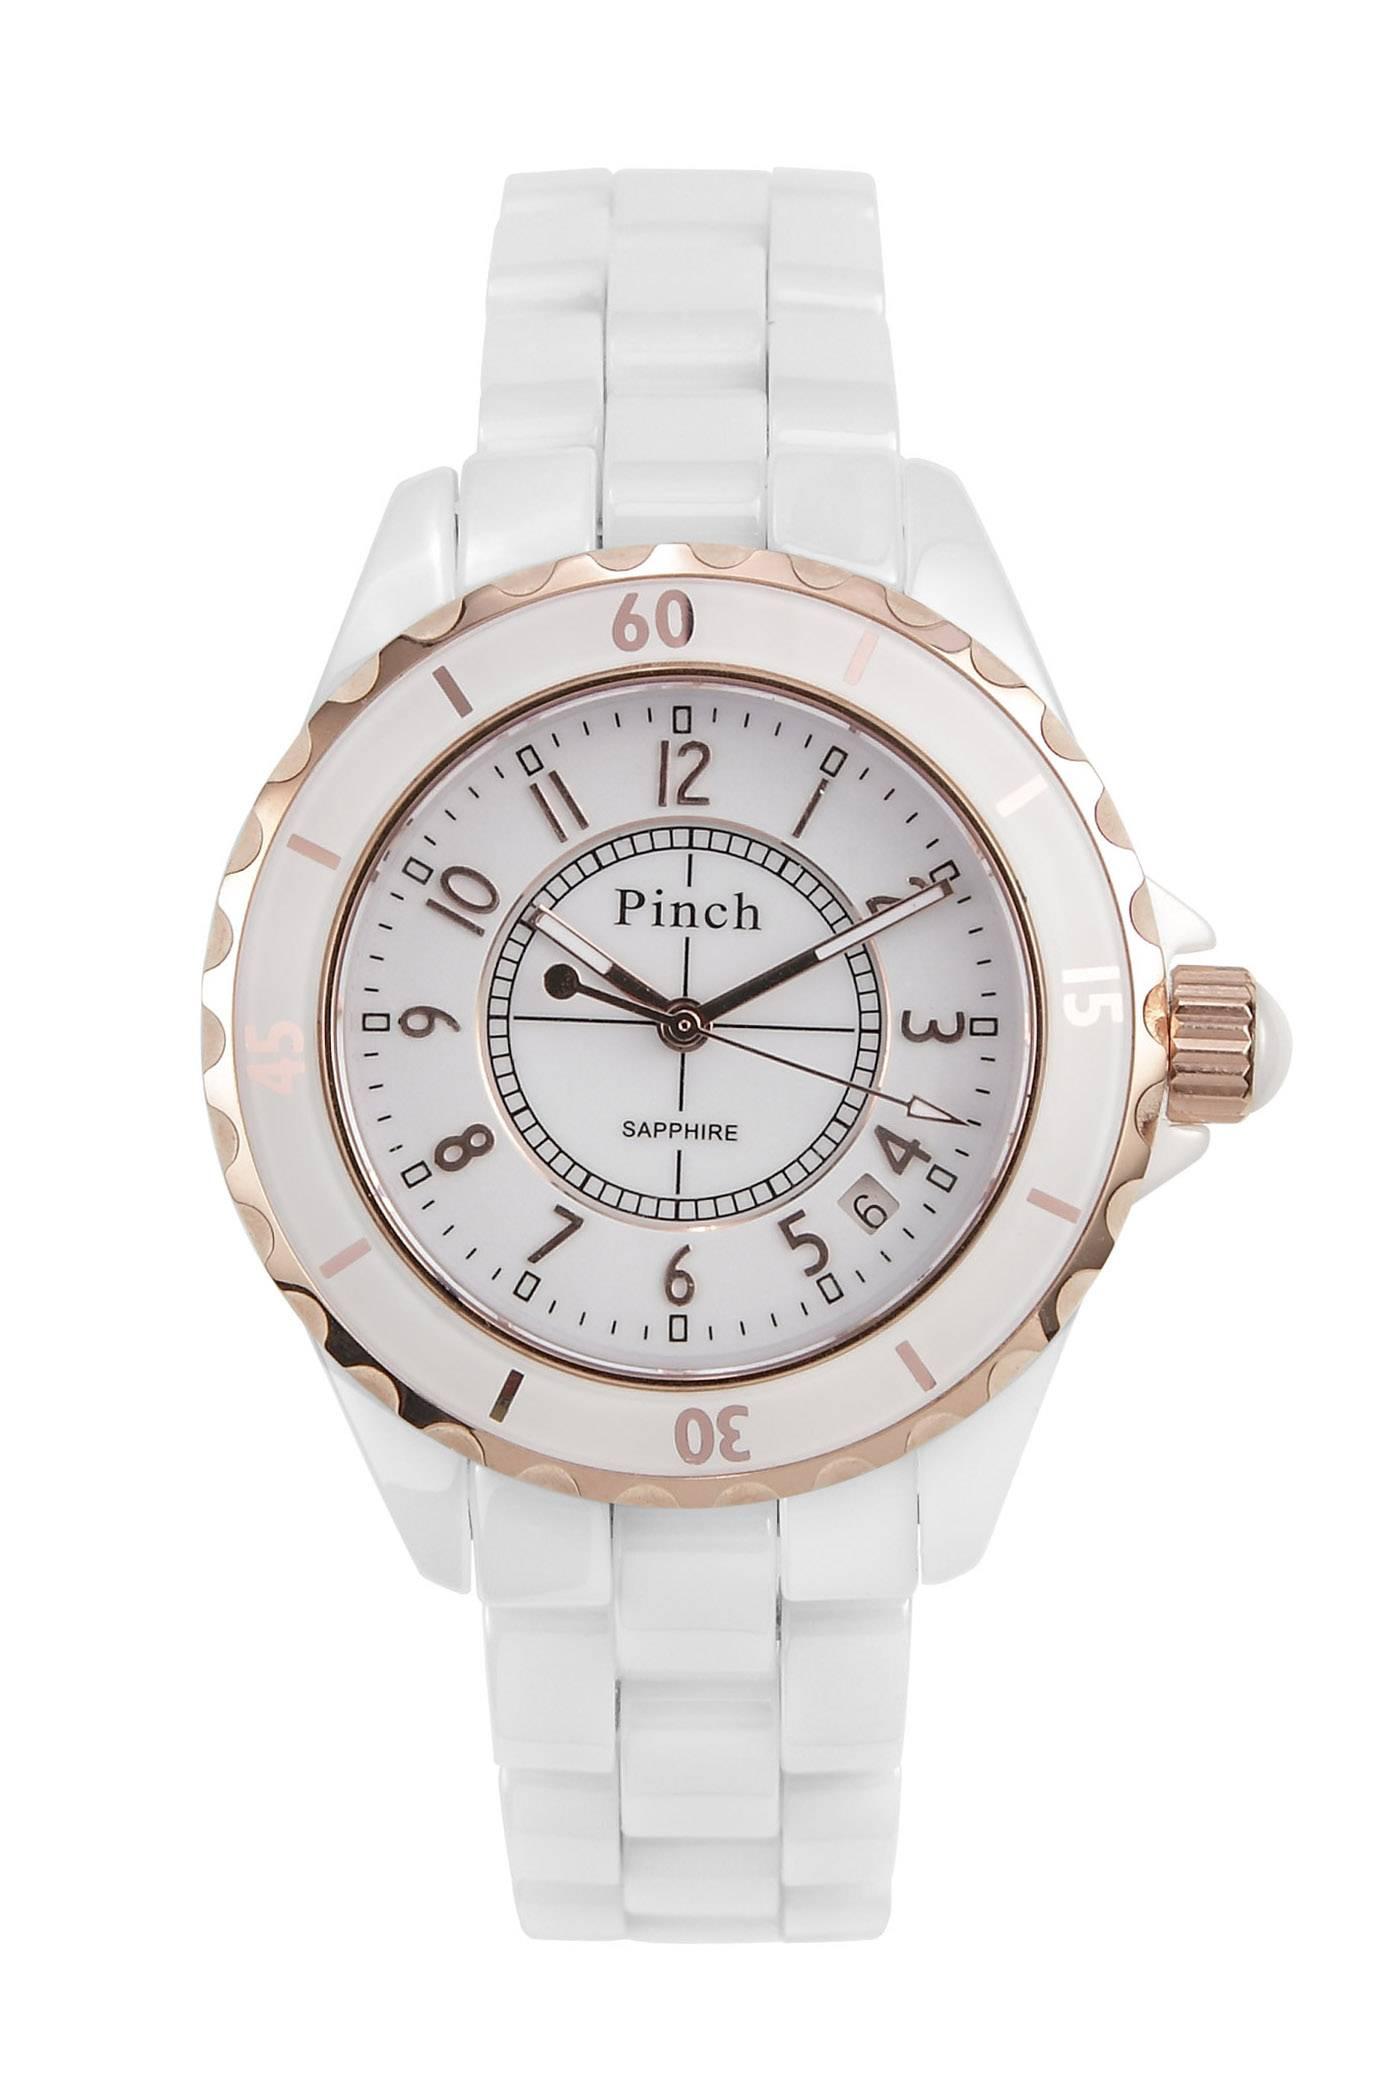 wholesale top quality ceramic watch